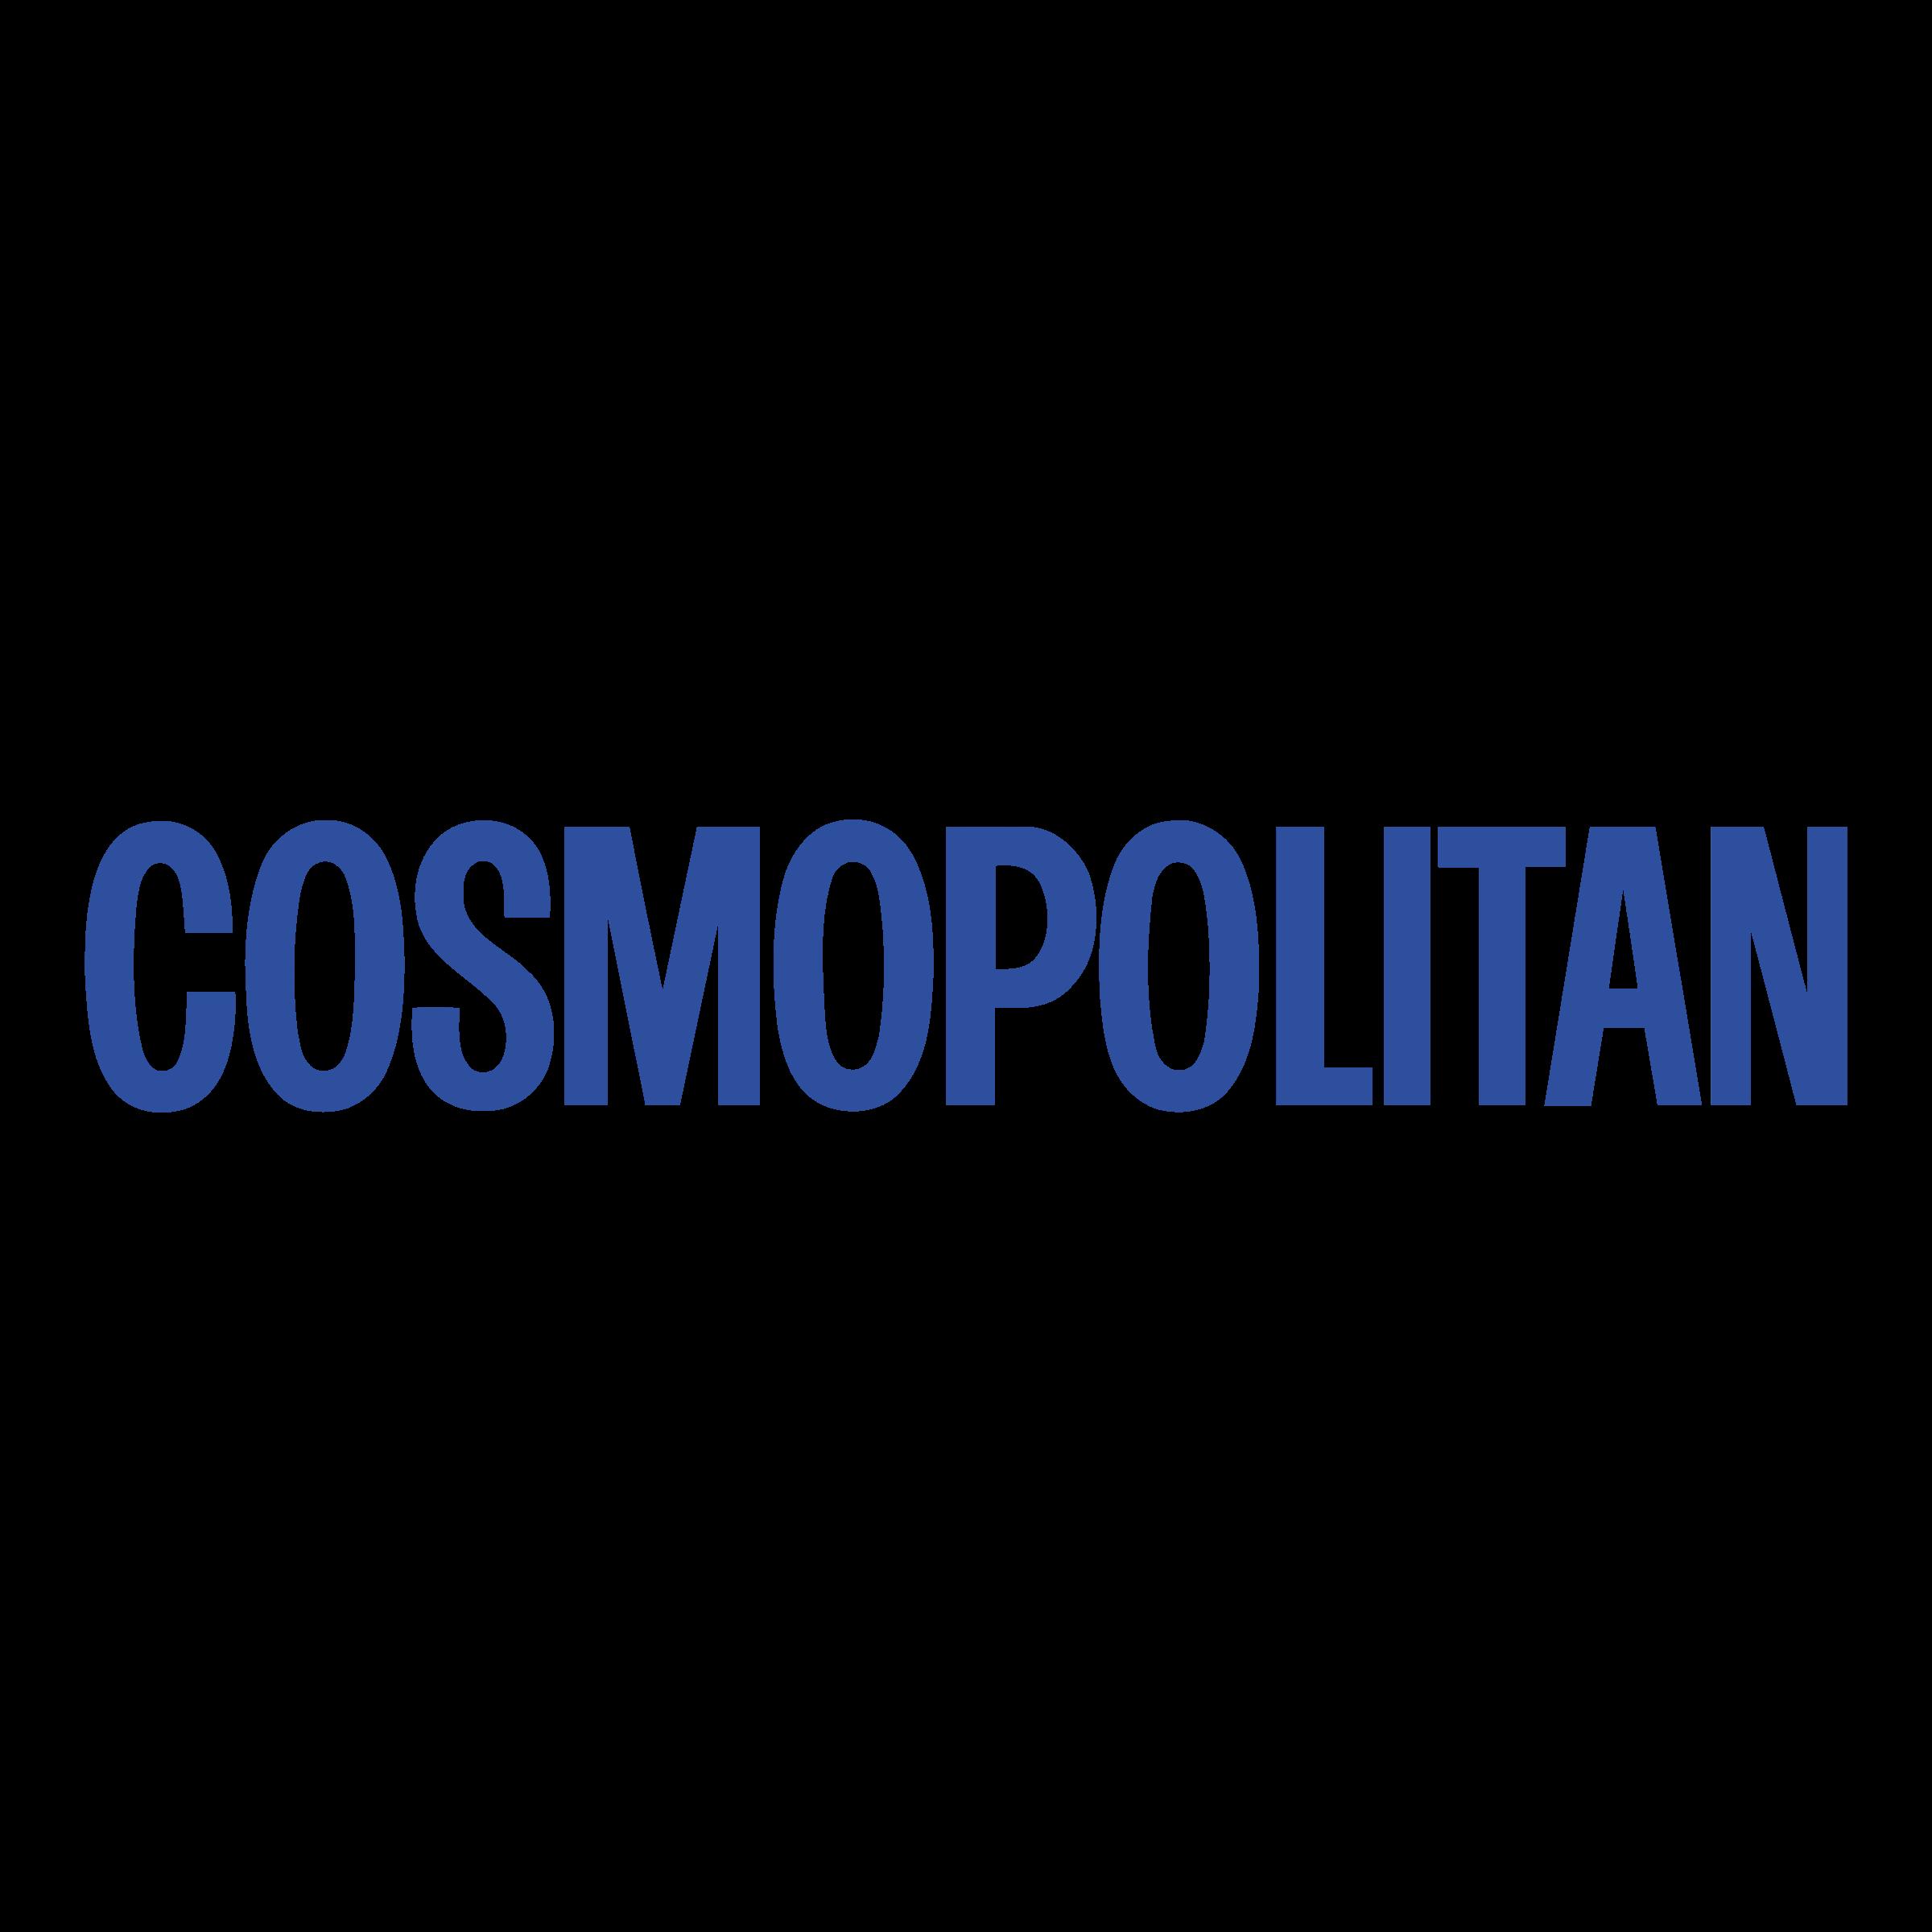 Cosmopolitan Logo PNG Transparent & SVG Vector.